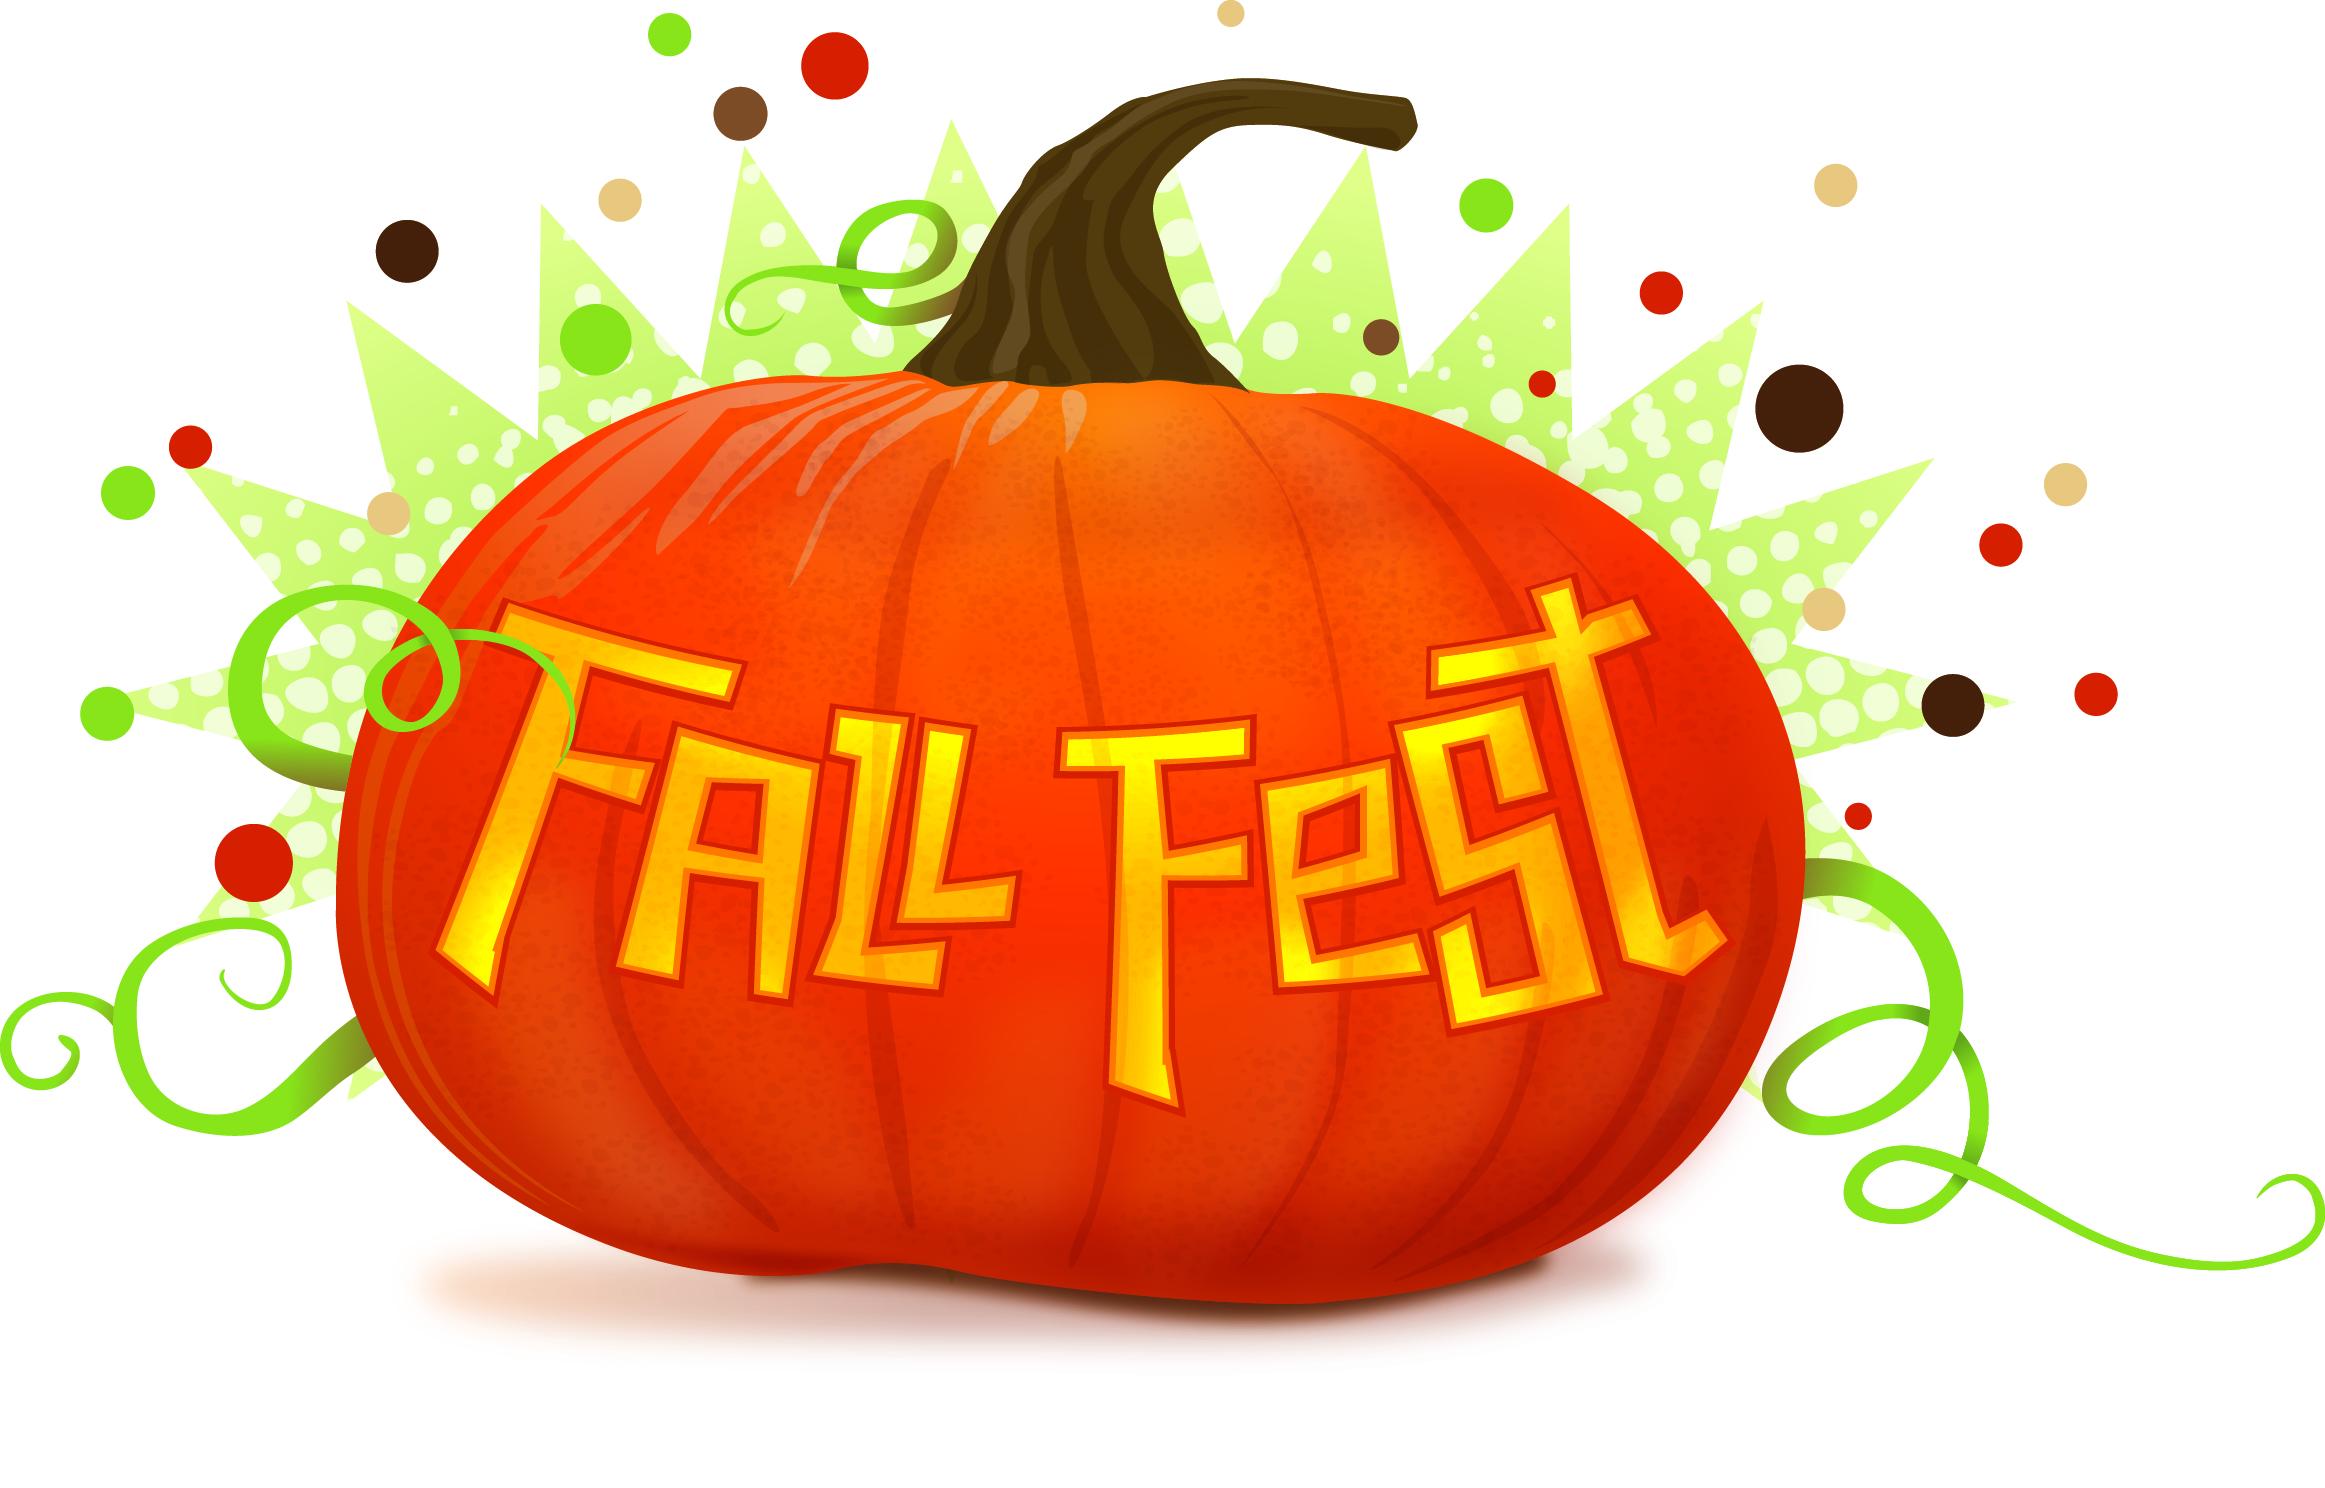 Clip Art Fall Festival Clip Art church festival clipart kid please join us for calvary s annual fall fest and yard sale